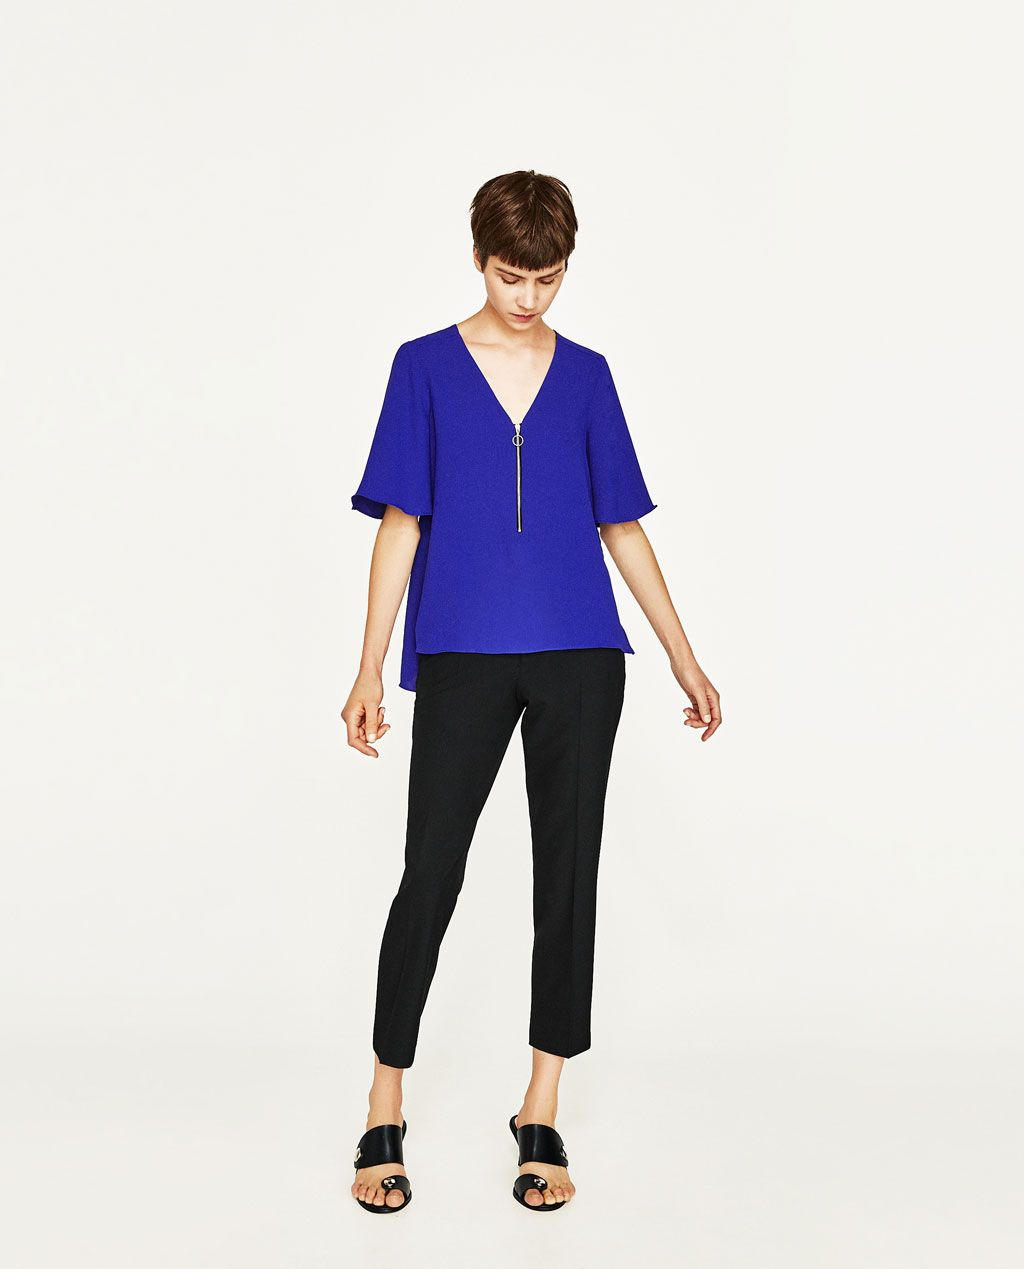 Image 1 Of V Neck Blouse With Zip From Zara Camisas Camisas Mujer Zara Ropa